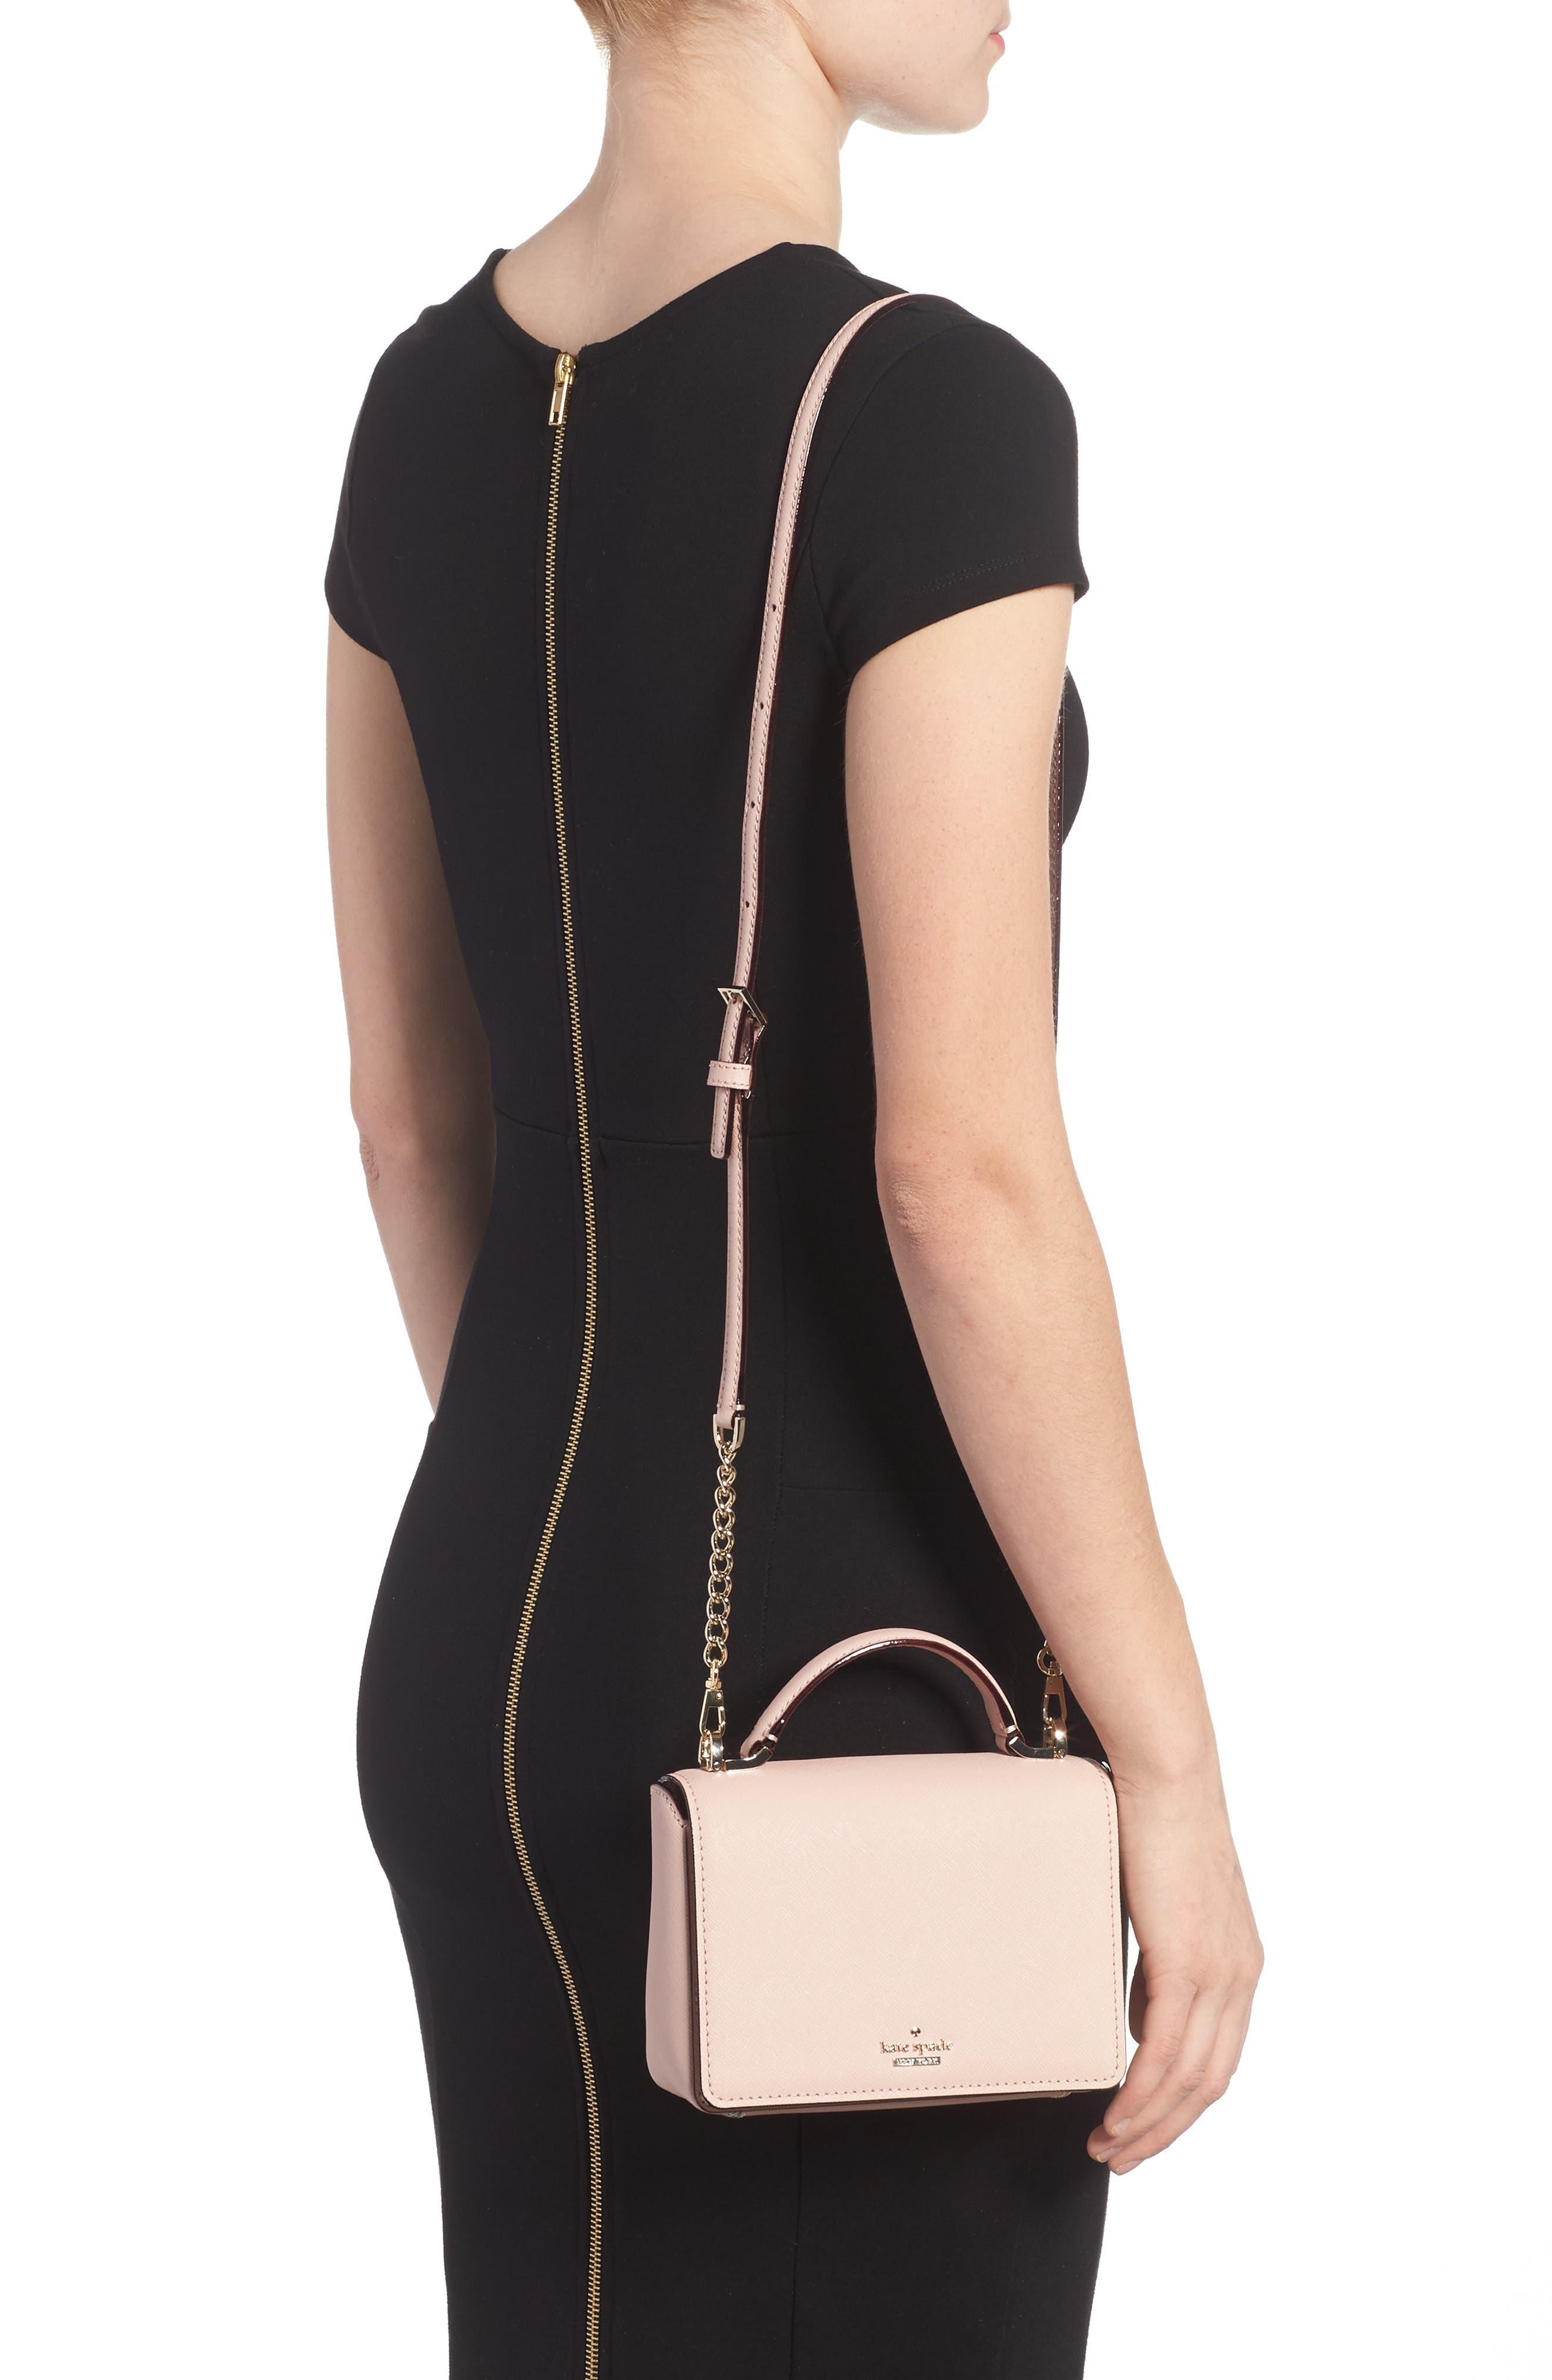 cameron street - hope saffiano leather crossbody bag,                             Alternate thumbnail 6, color,